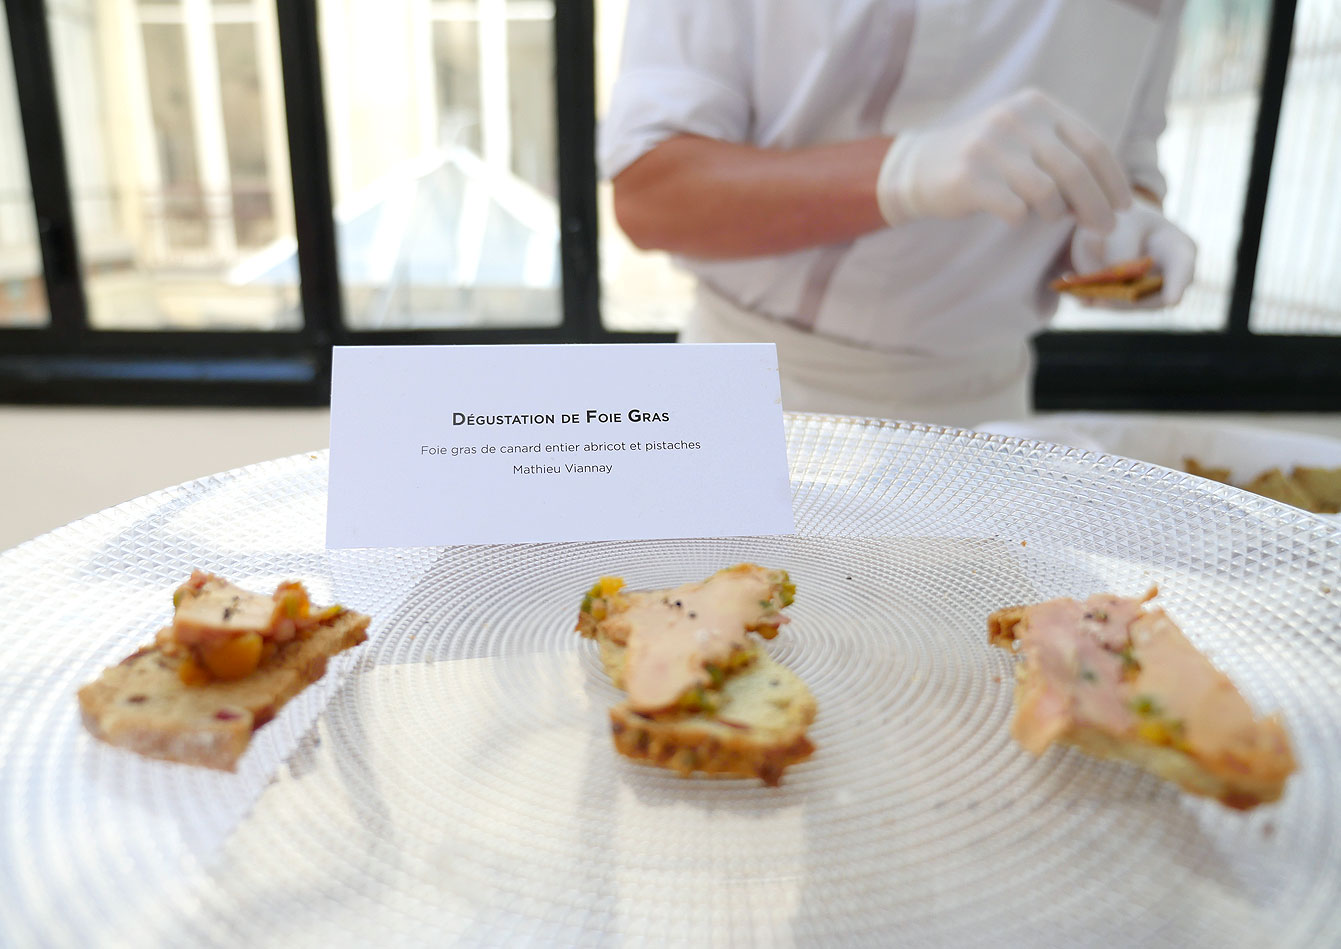 noel-monoprix-foie-gras-viannay-22